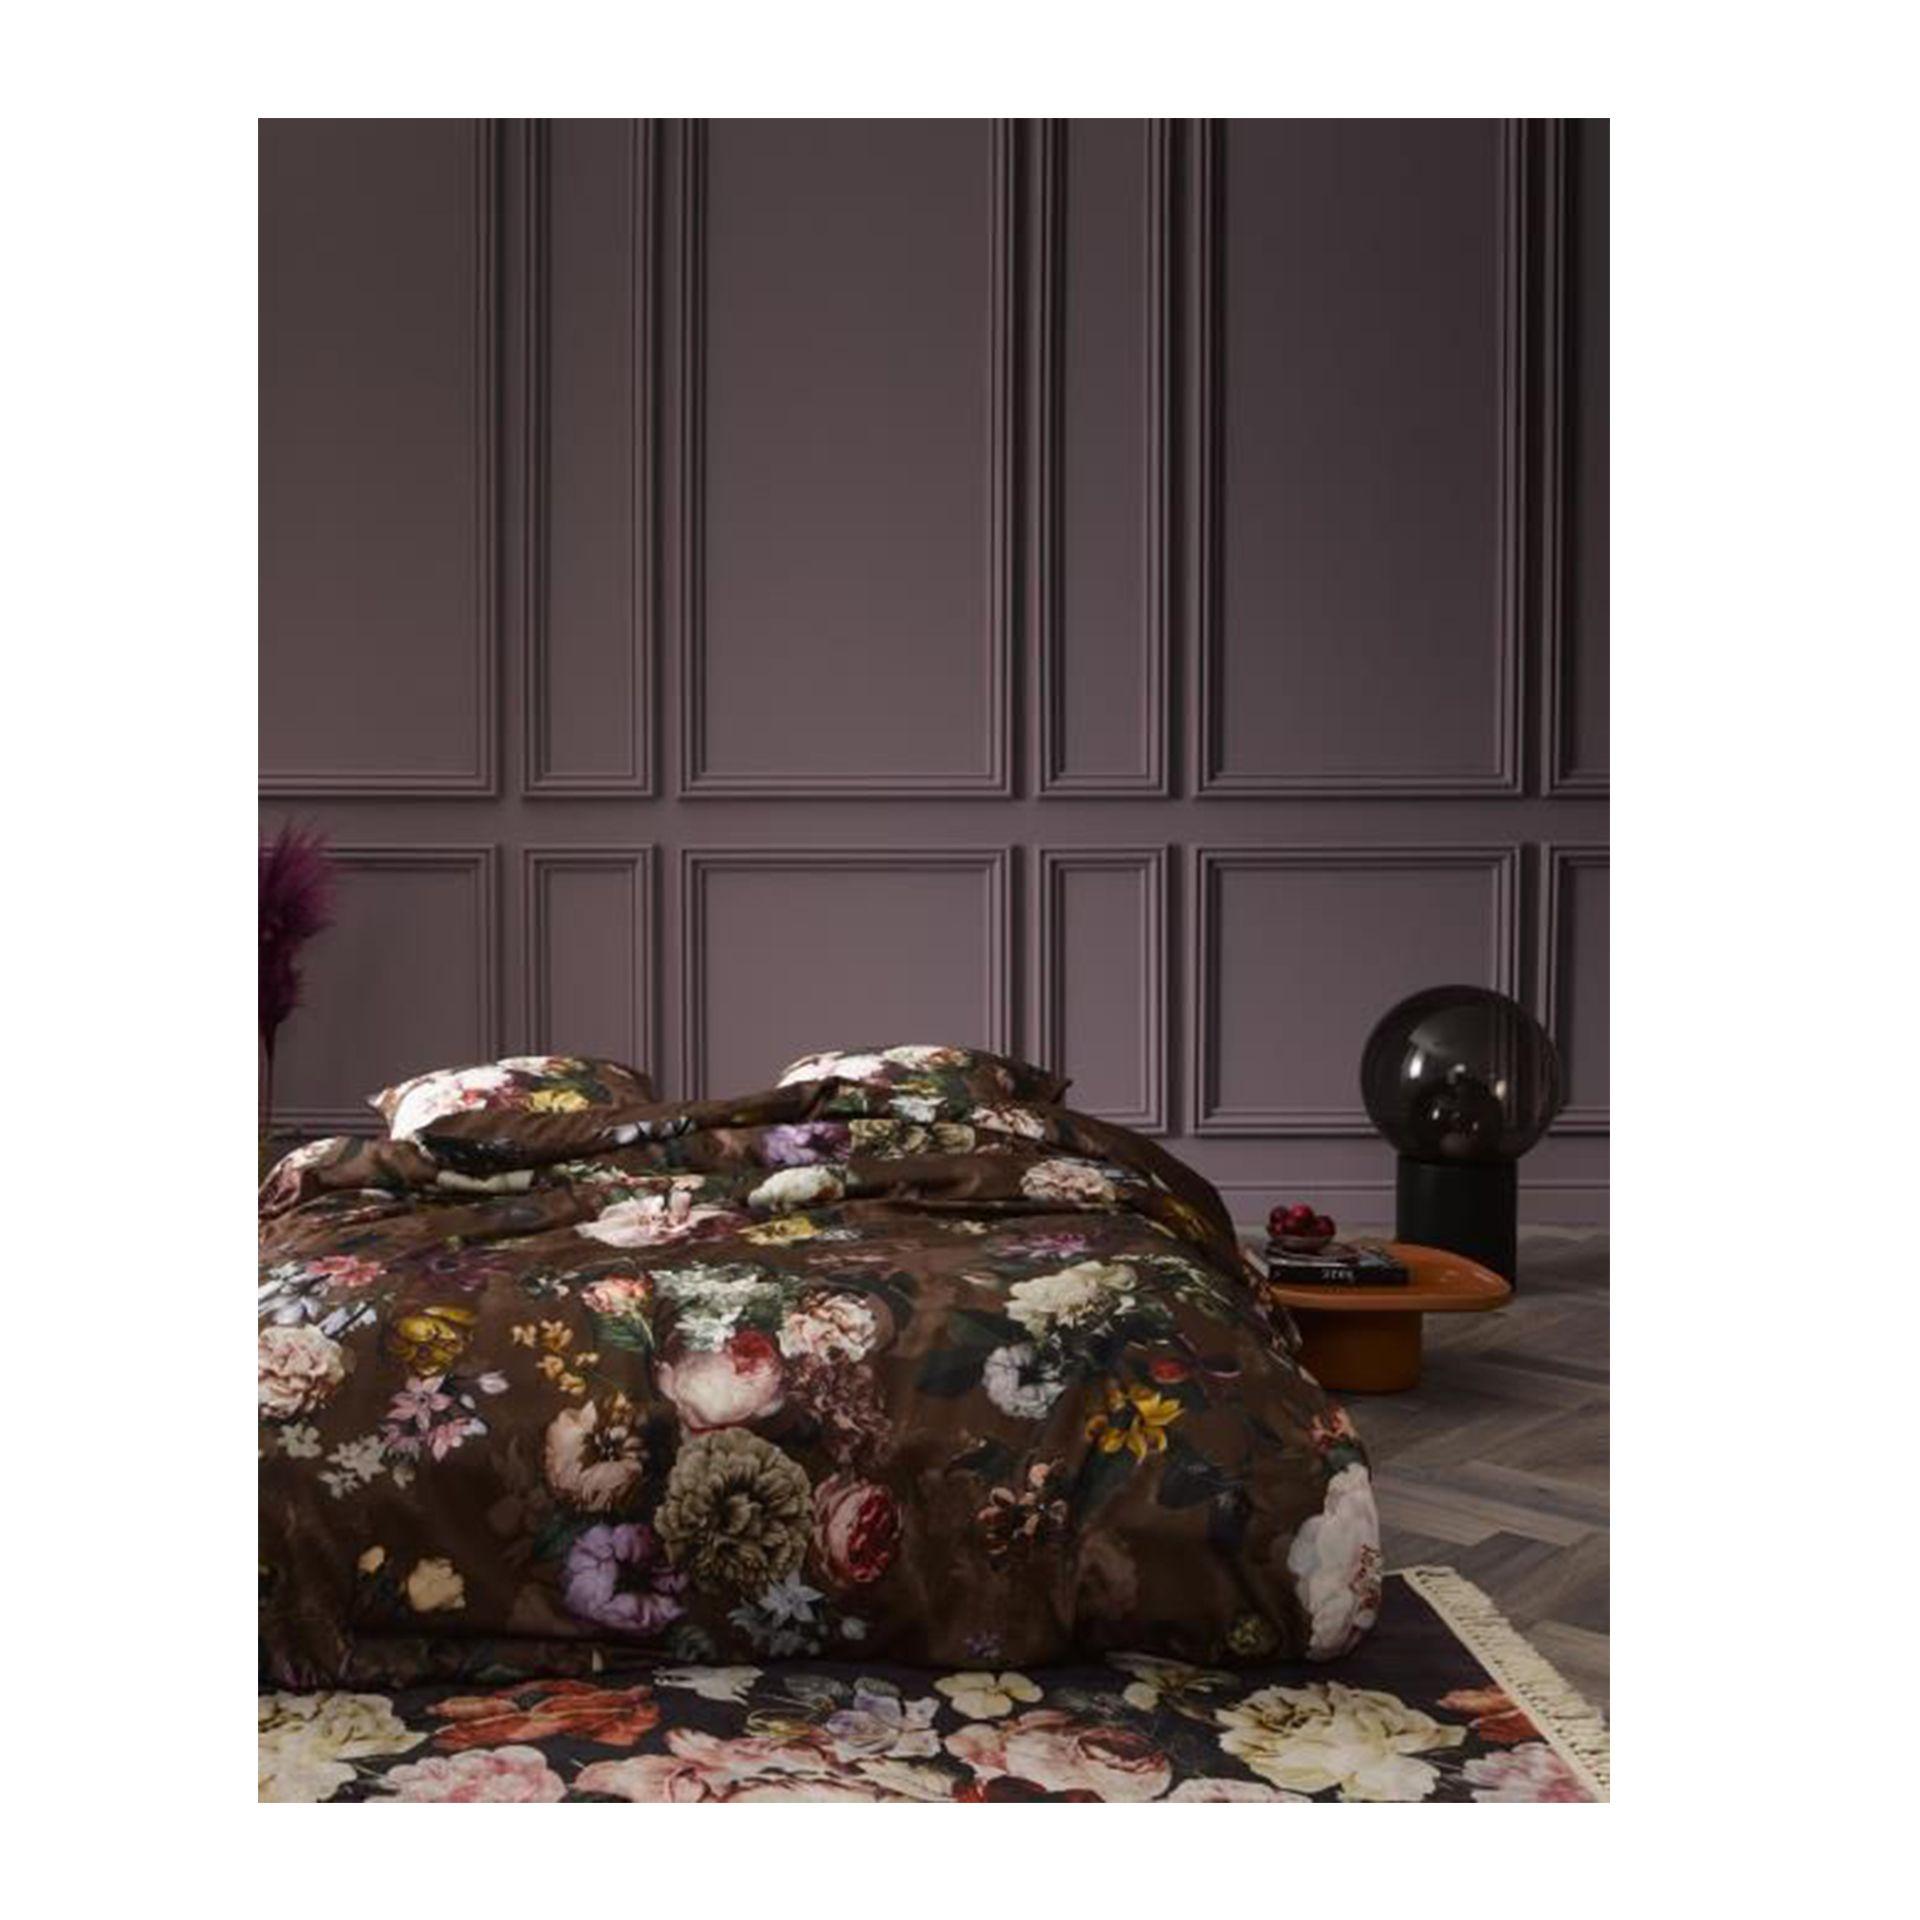 Essenza Fleur - Dekbedovertrek - Chocolate